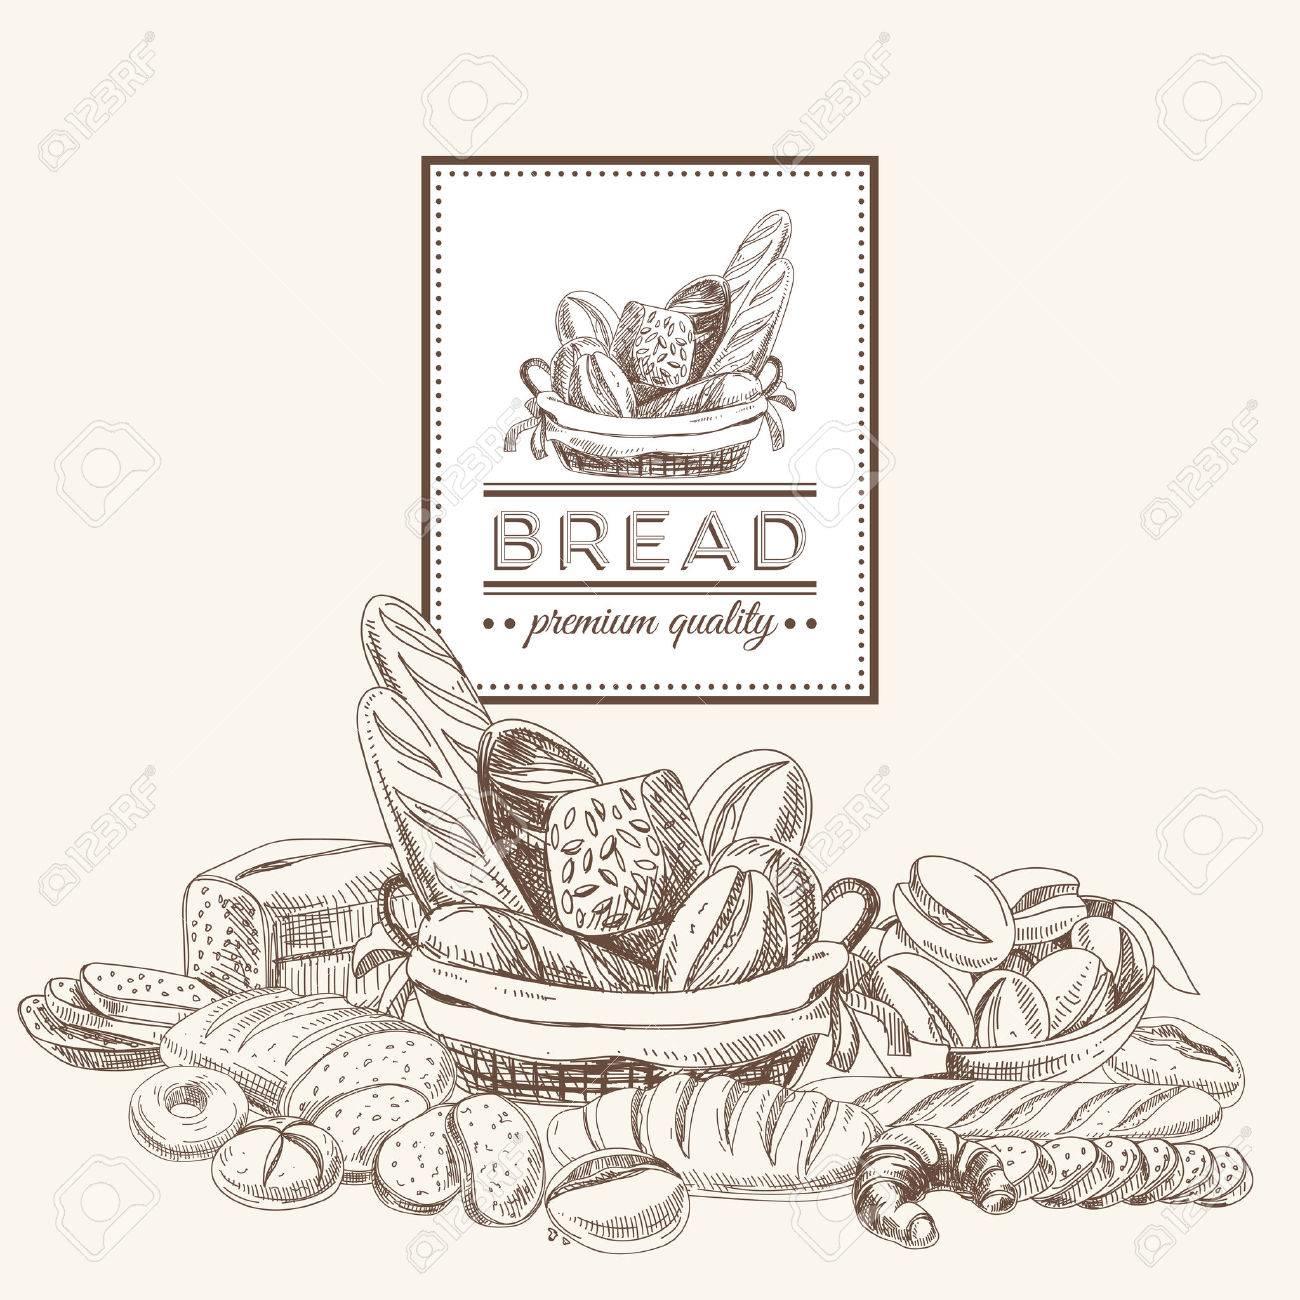 Vector bakery retro background. Vintage Illustration with bread. Sketch. - 49424377